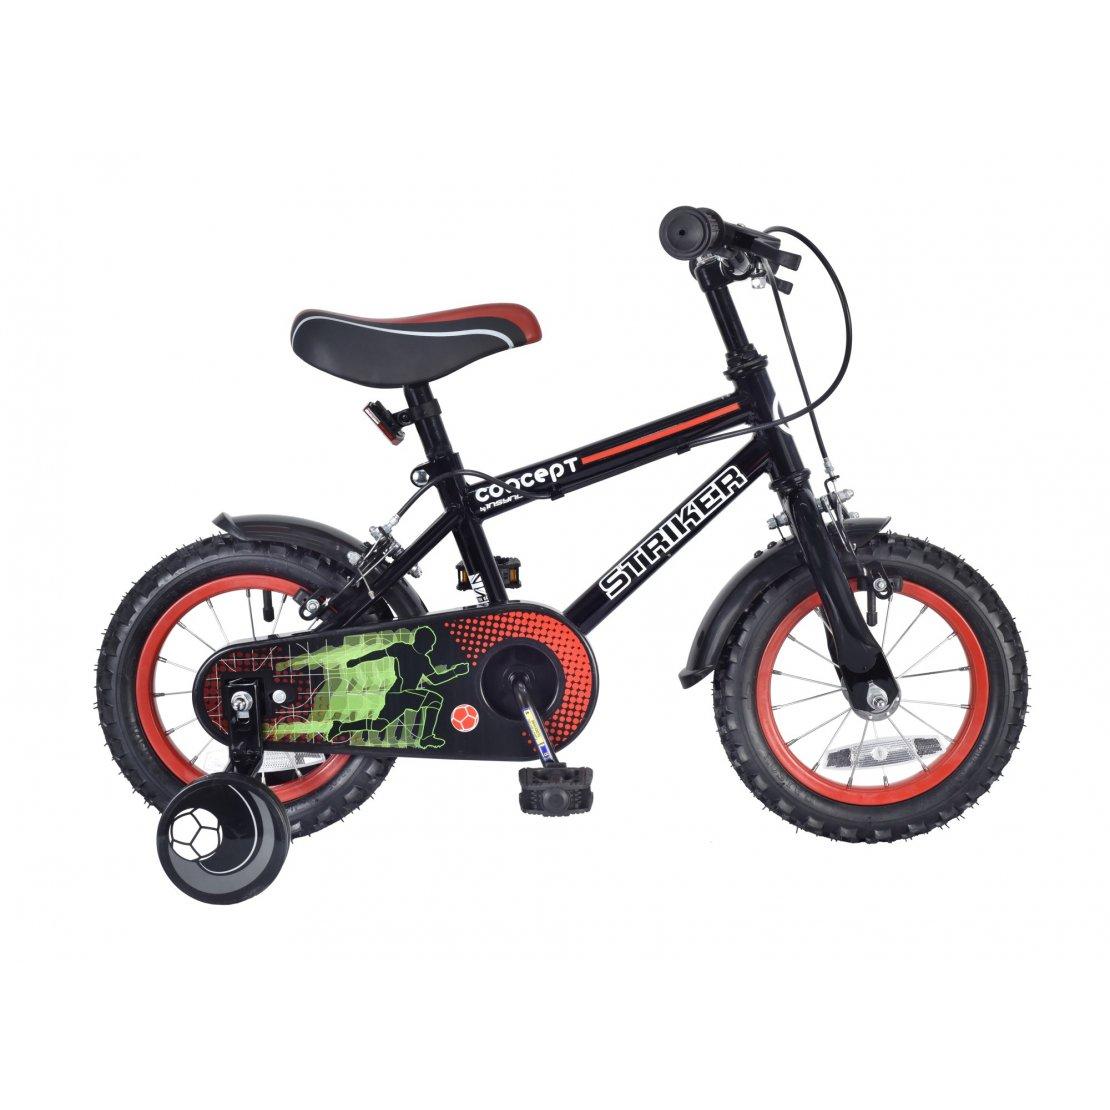 "Concept Striker 12"" Wheel Boys Bicycle (CN0021)"